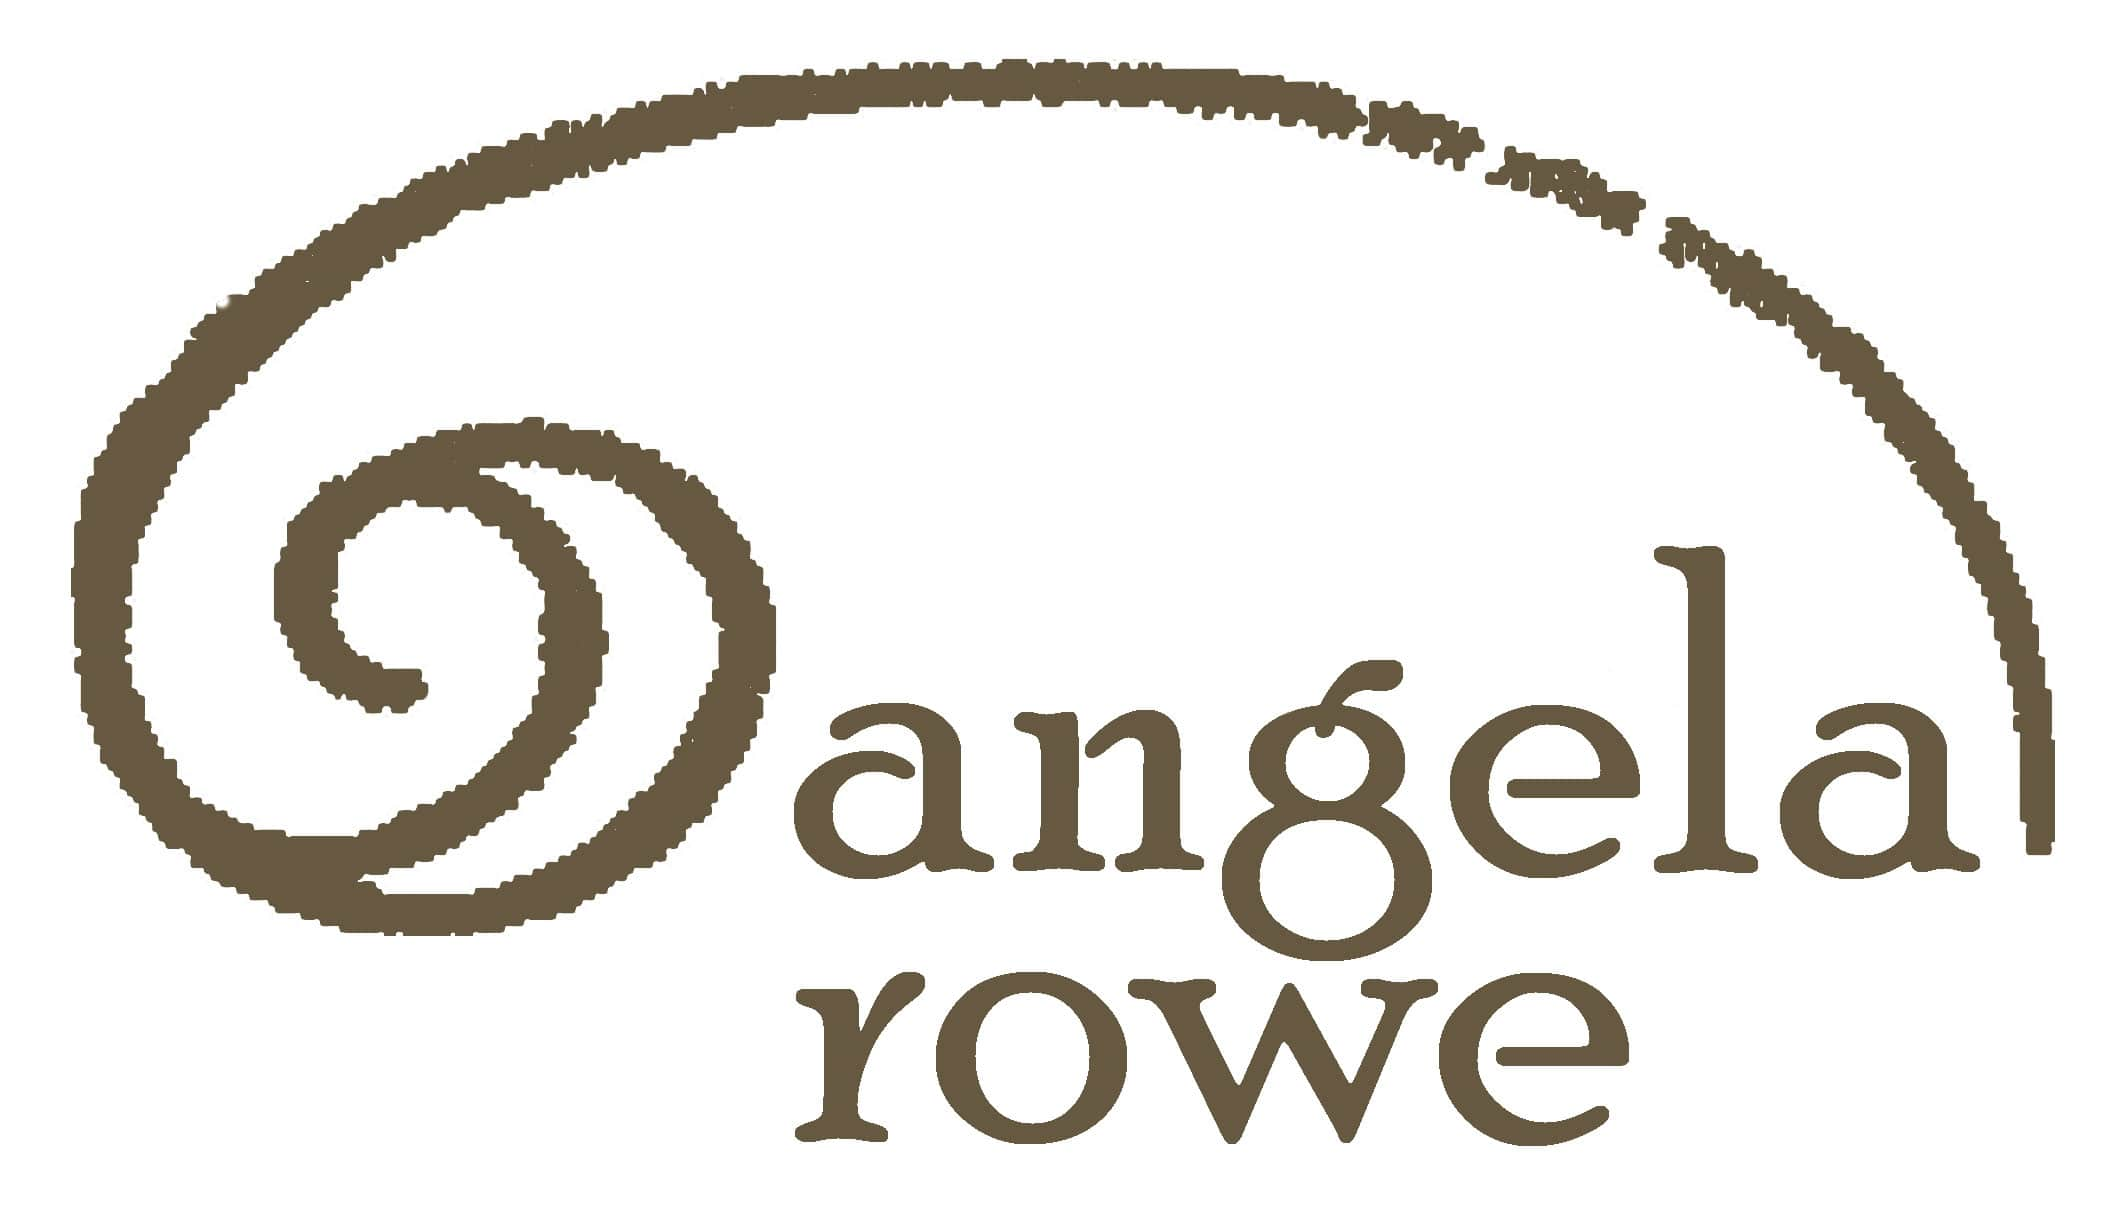 Coaching Angela Rowe Logo